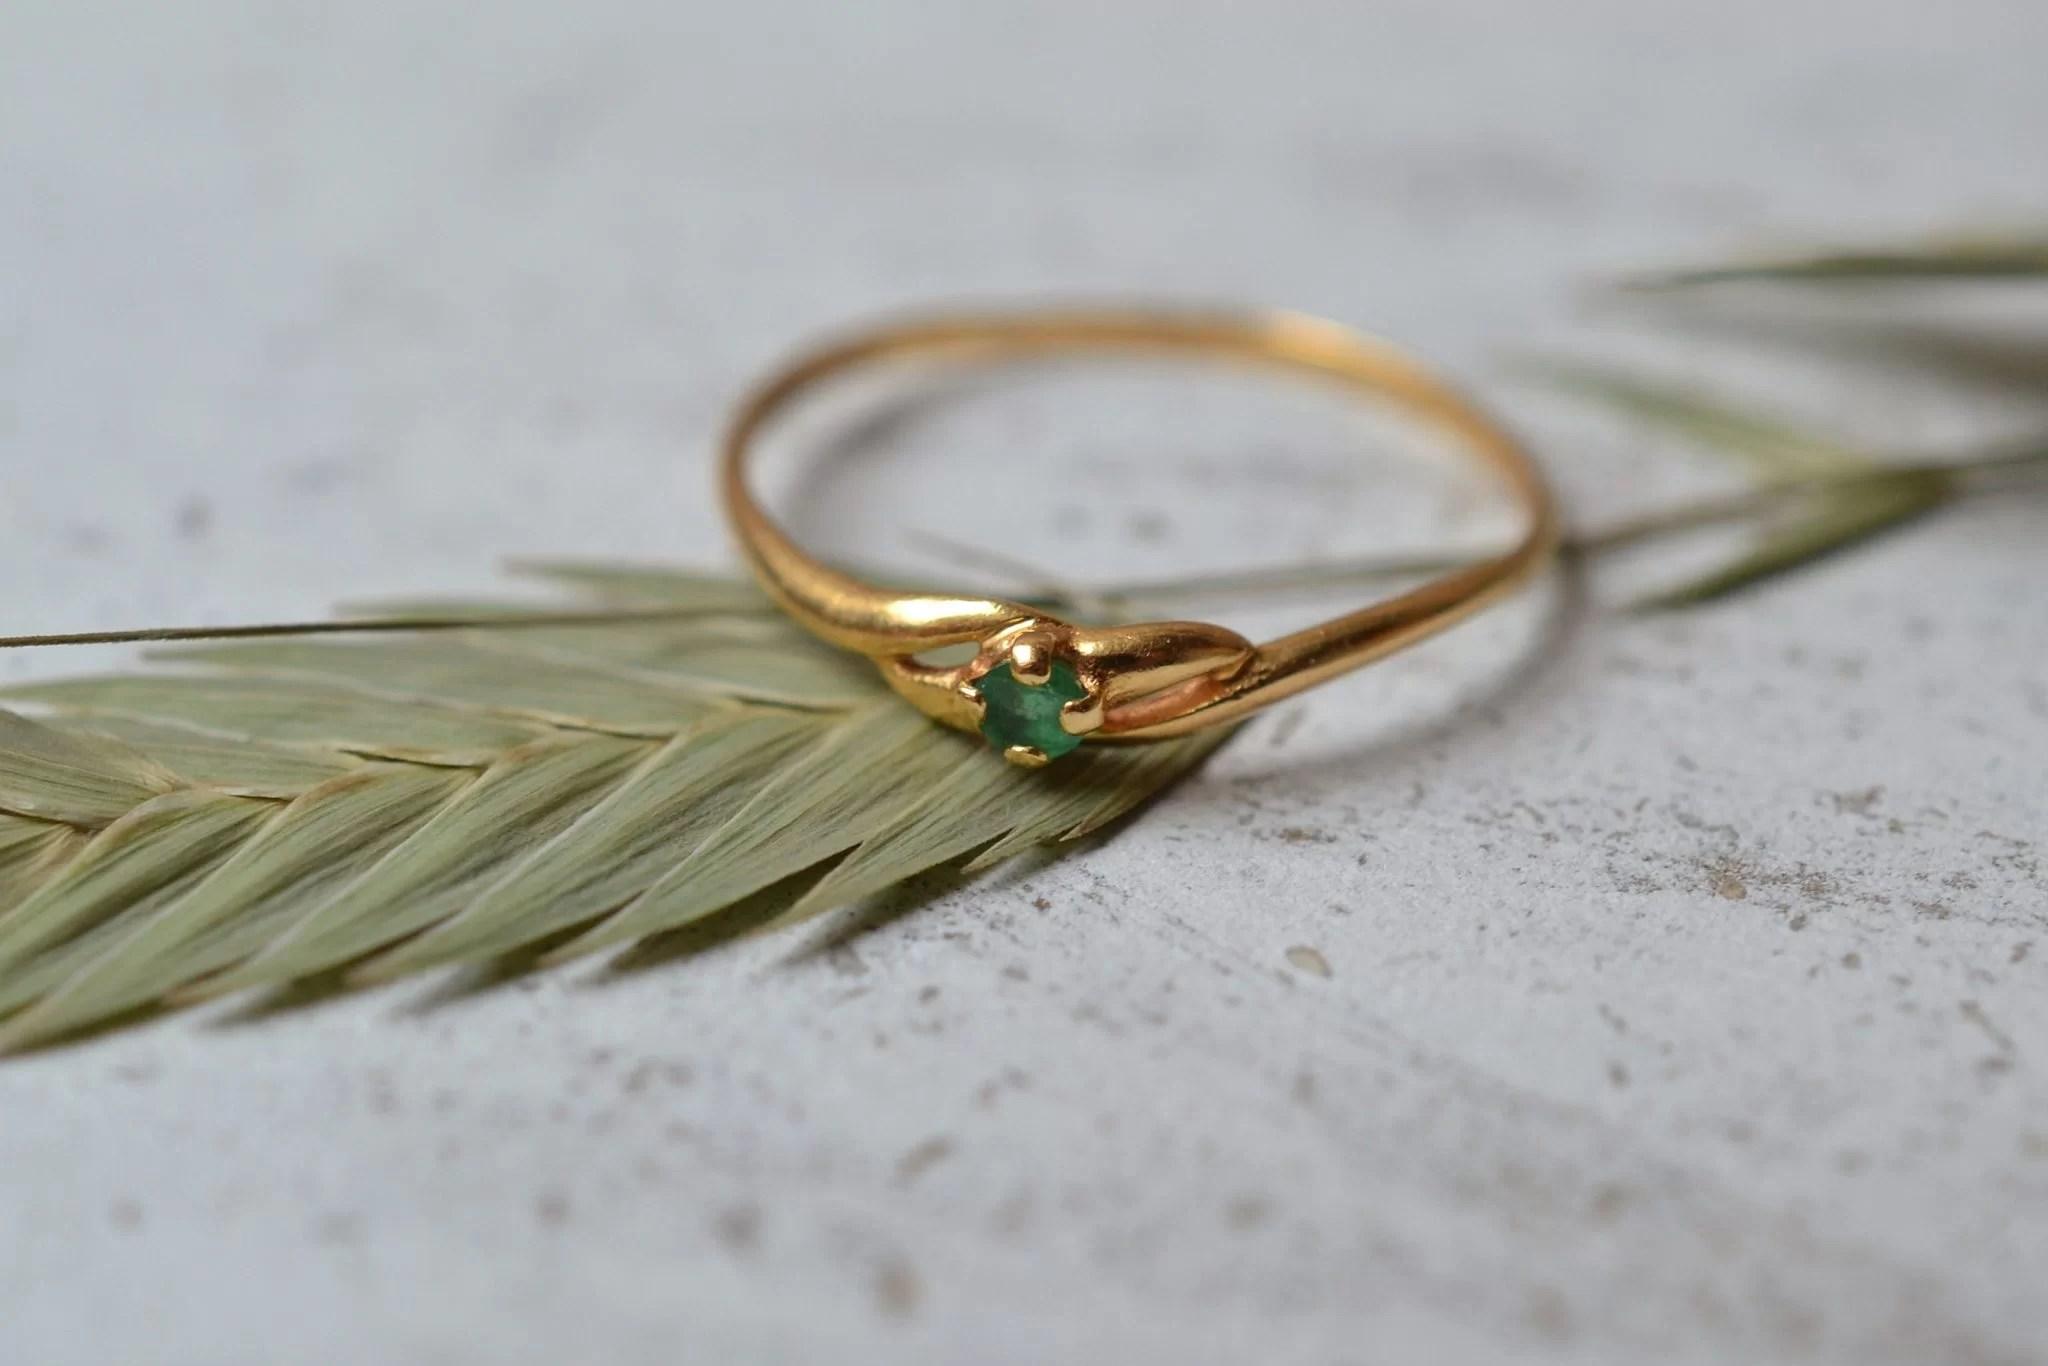 Bague en Or jaune sertie d_une petite pierre verte - bague ancienne